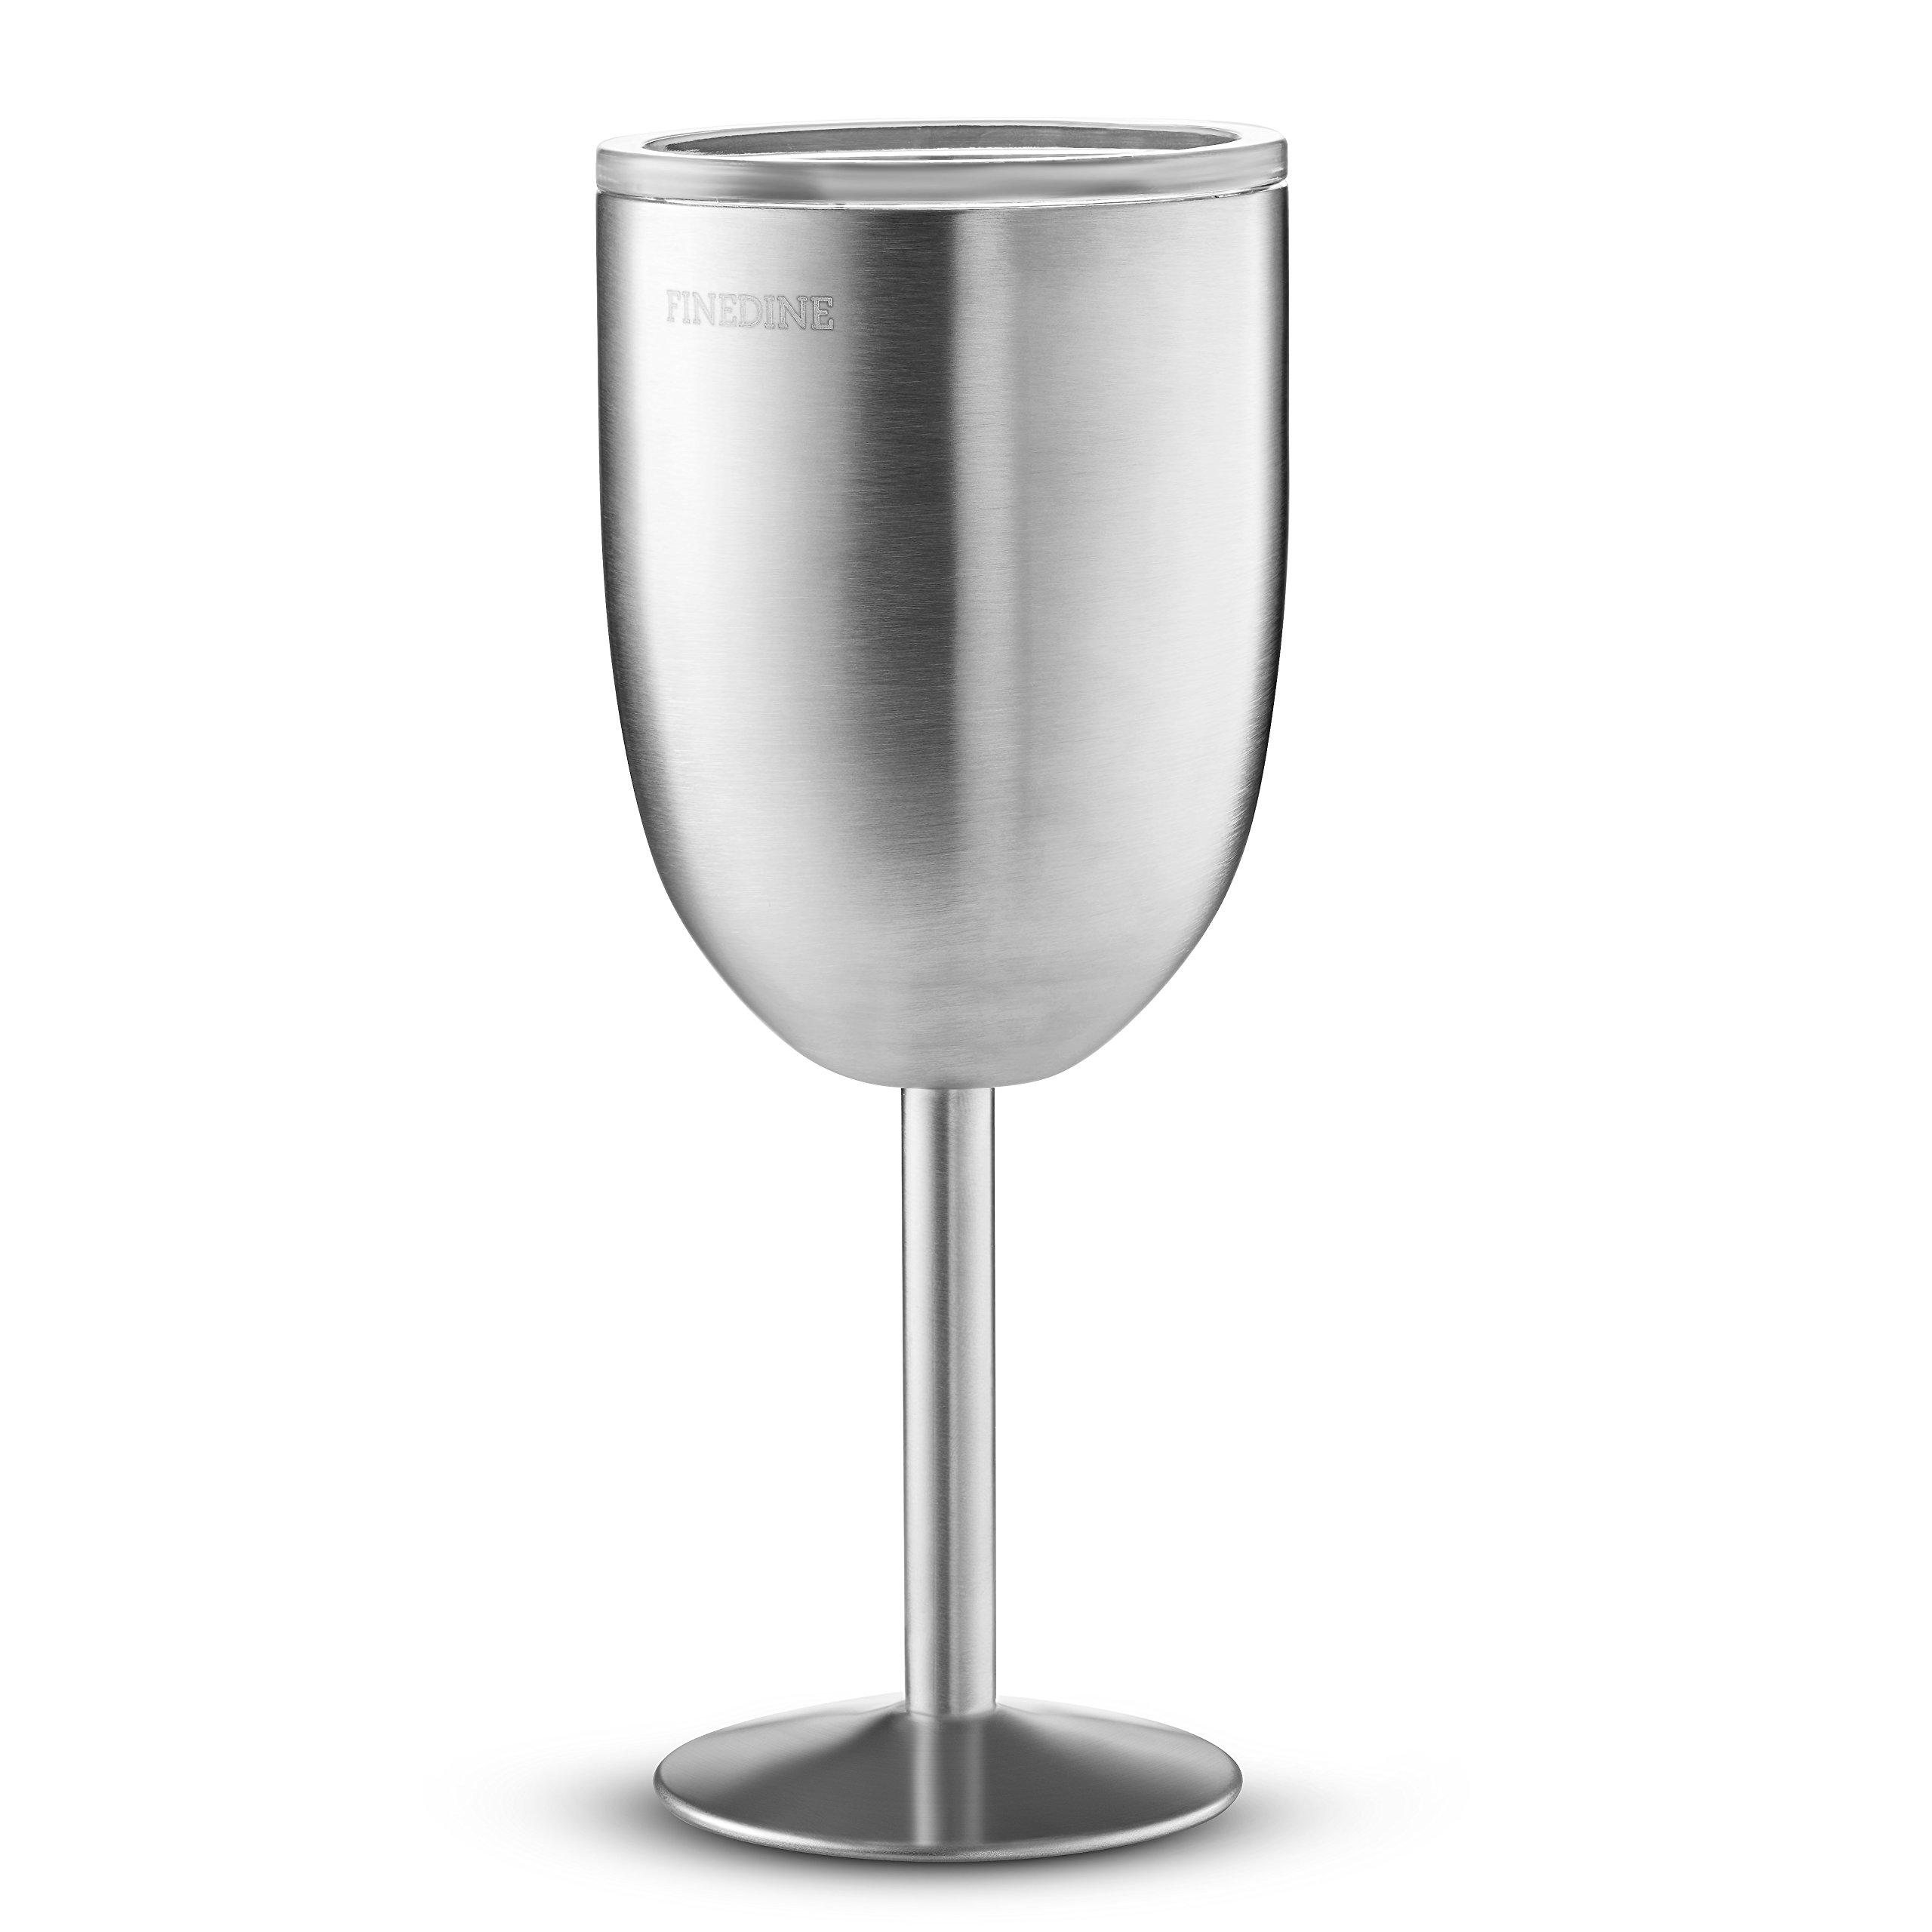 ea97454397b FineDine Premium Grade 18/8 Stainless Steel Wine Glasses 12 Oz. Double-Walled  Insulated Unbreakable Goblets (Set of 2) Stemmed Wine Glass BPA-Free Leak  ...